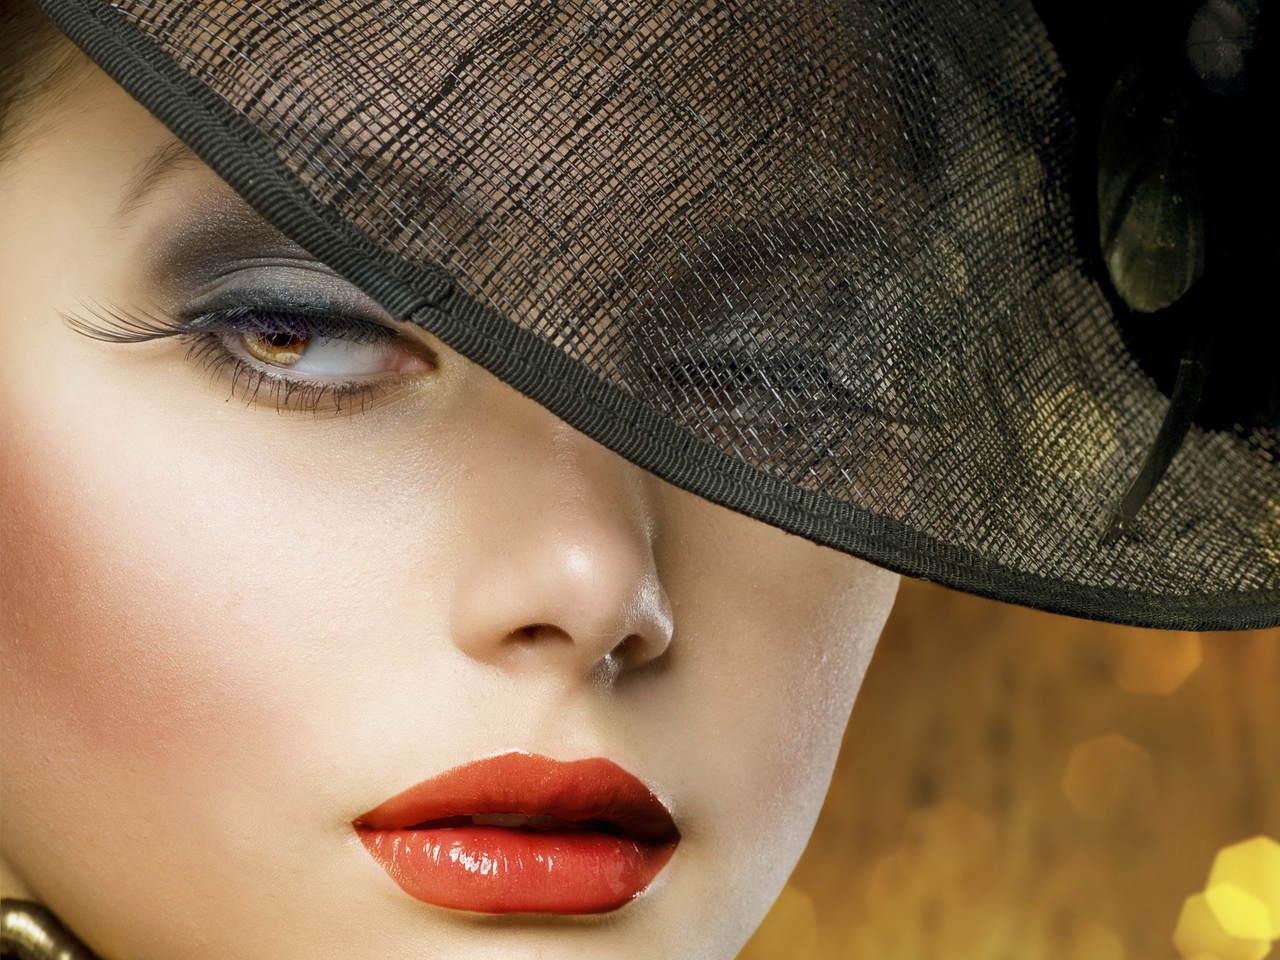 Girl Wallpaper: Download HD Hot Girls Wallpaper for ...